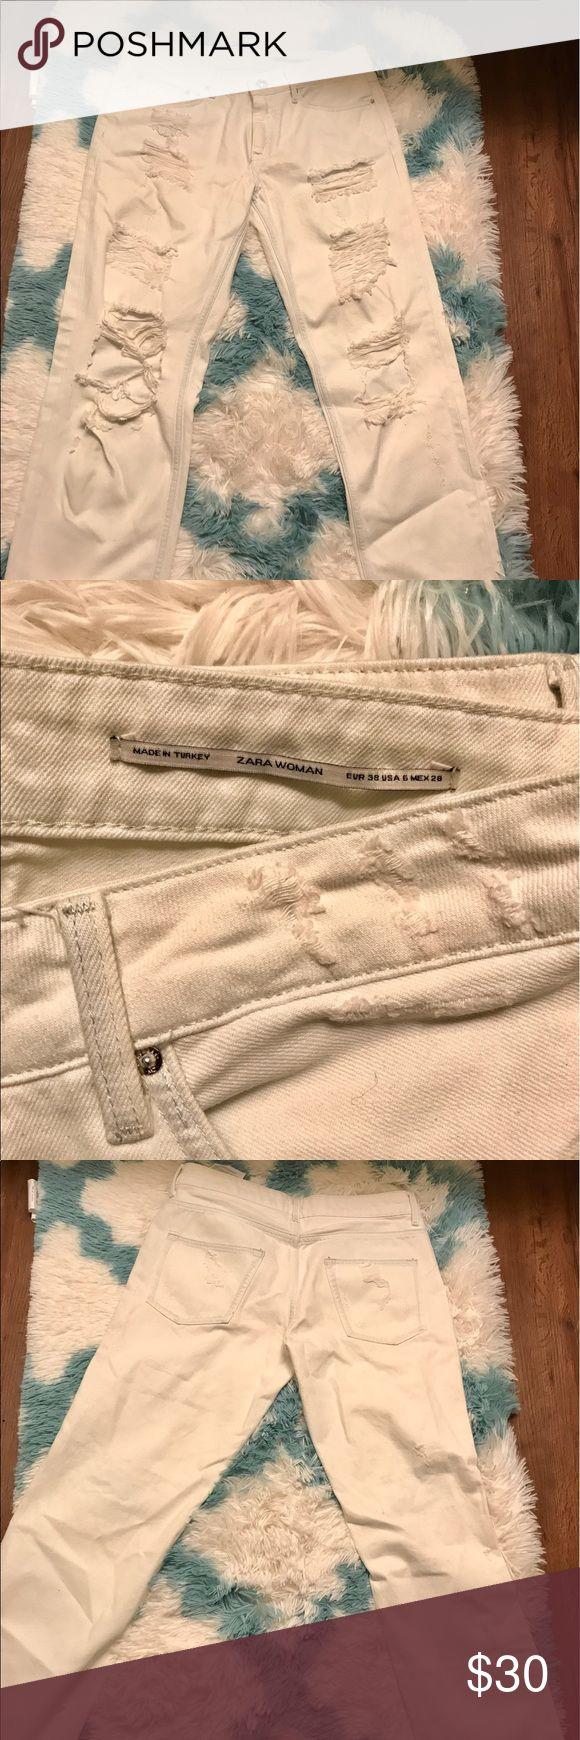 Pre-owned Zara jeans Pre-owned Zara boyfriend jeans. Zara Jeans Boyfriend